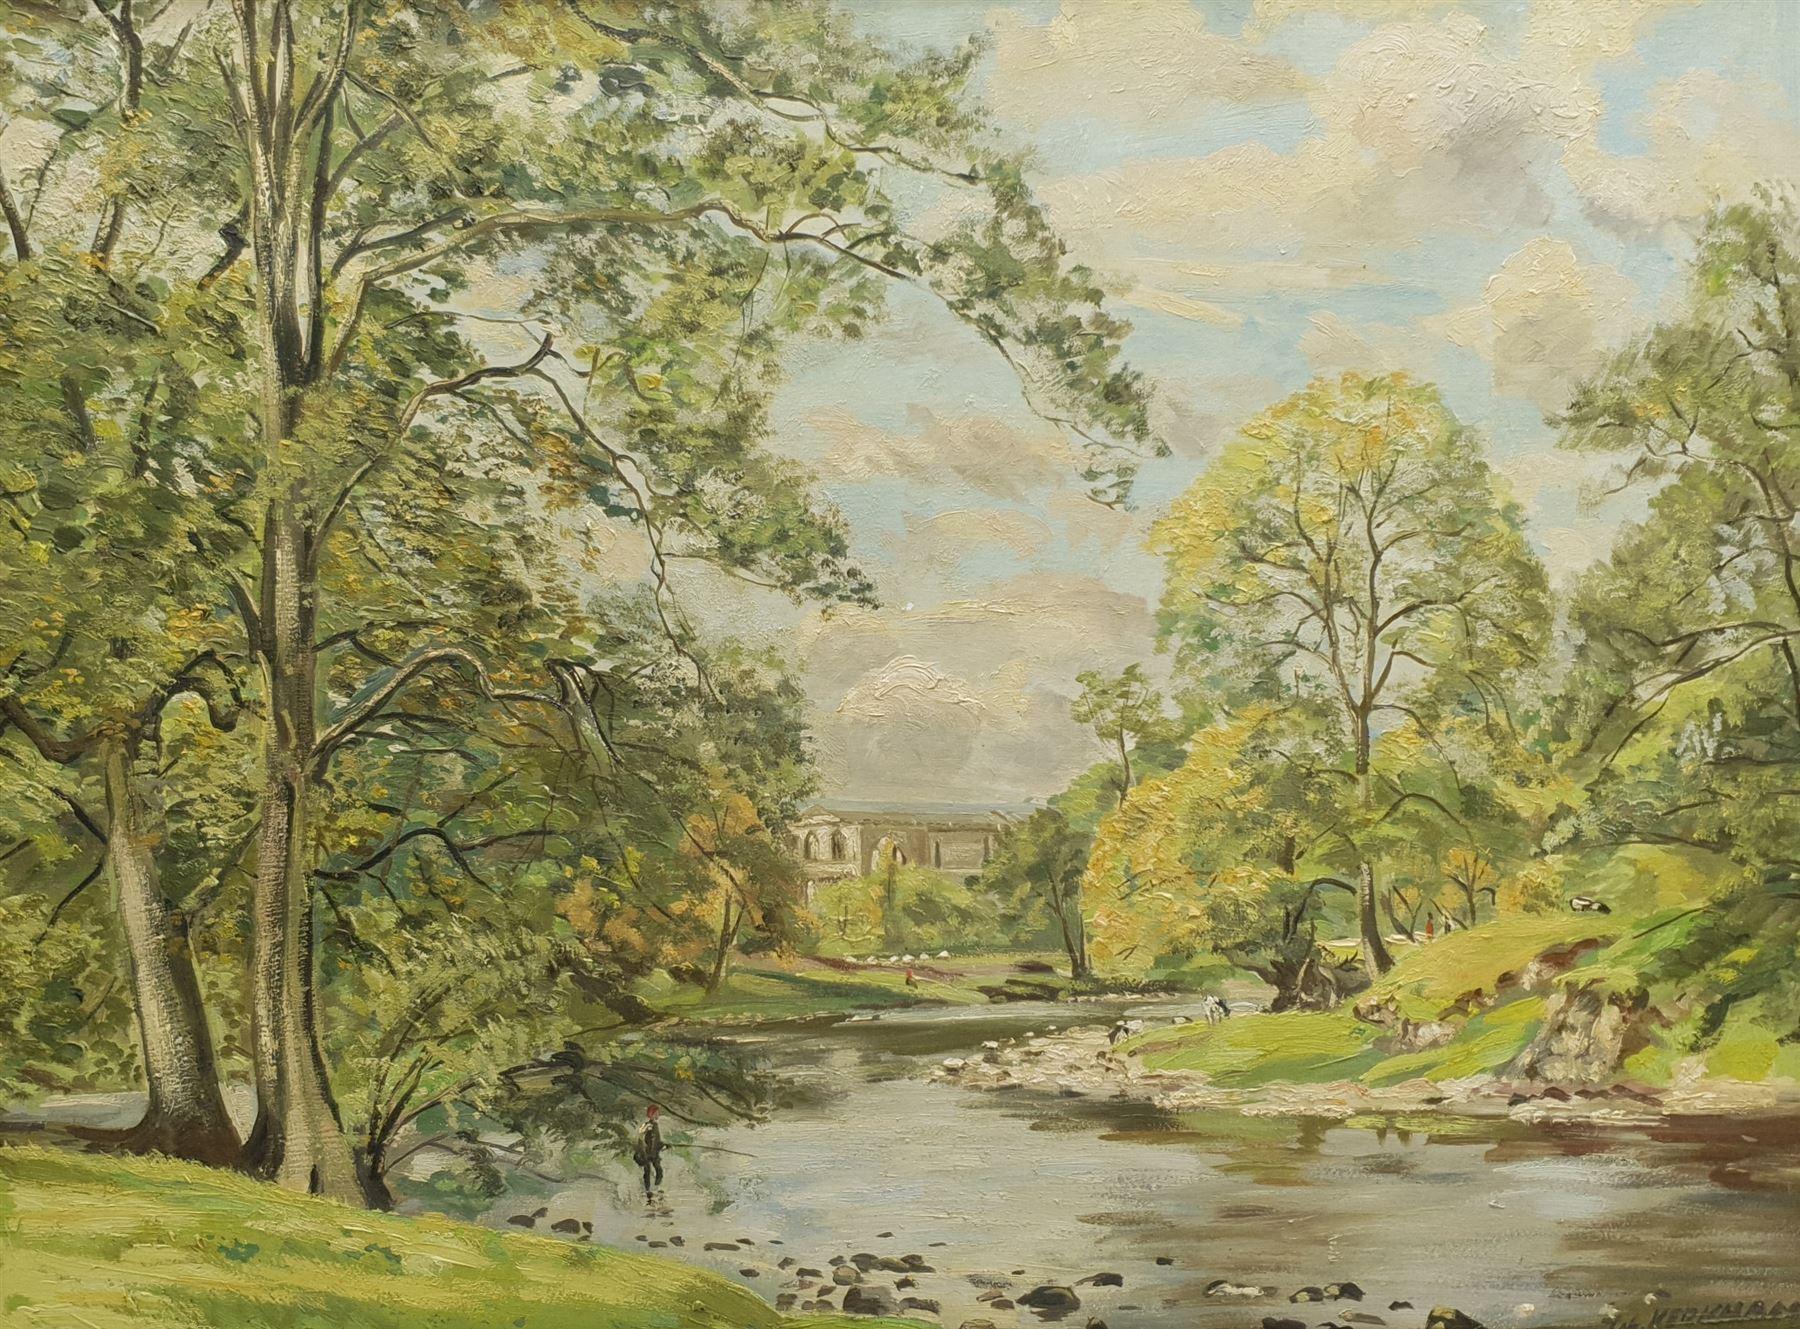 Thomas Leslie Kerkham (British 1918-1986): Bolton Abbey with Fly Fisherman on the Wharfe